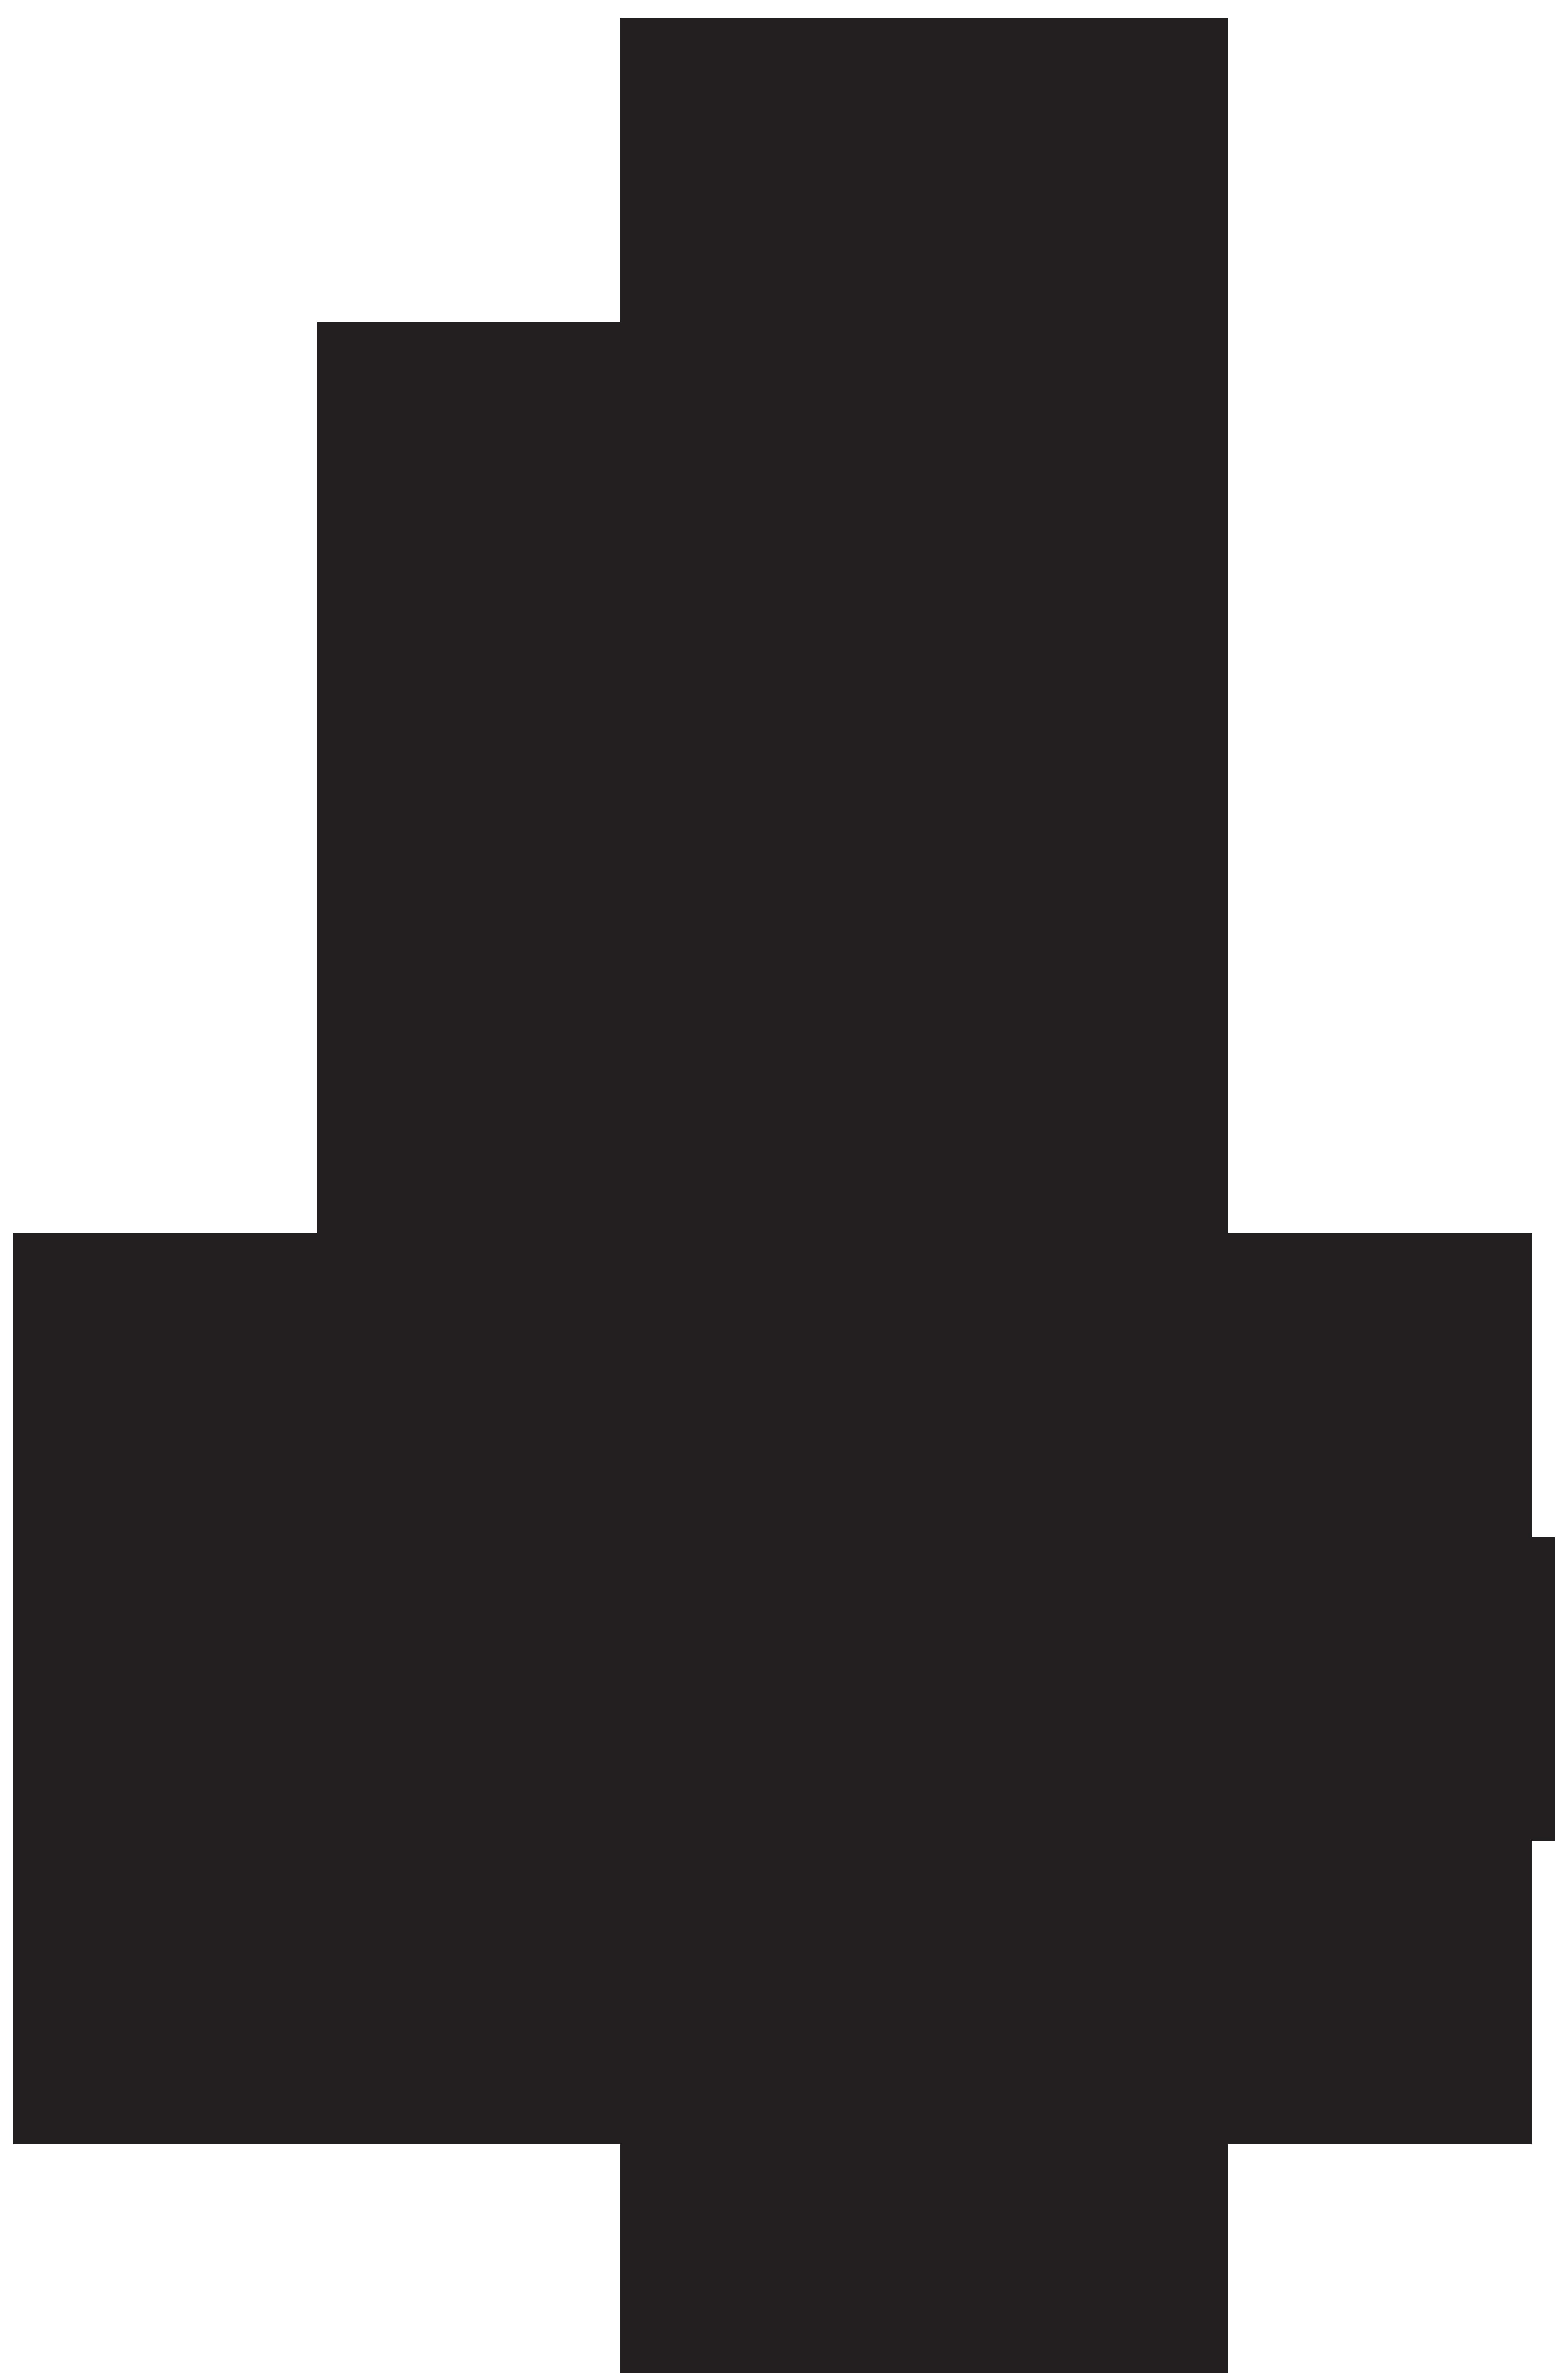 Cedar tree silhouette clipart clip royalty free library Pine trees silhouette clipart images gallery for free download ... clip royalty free library